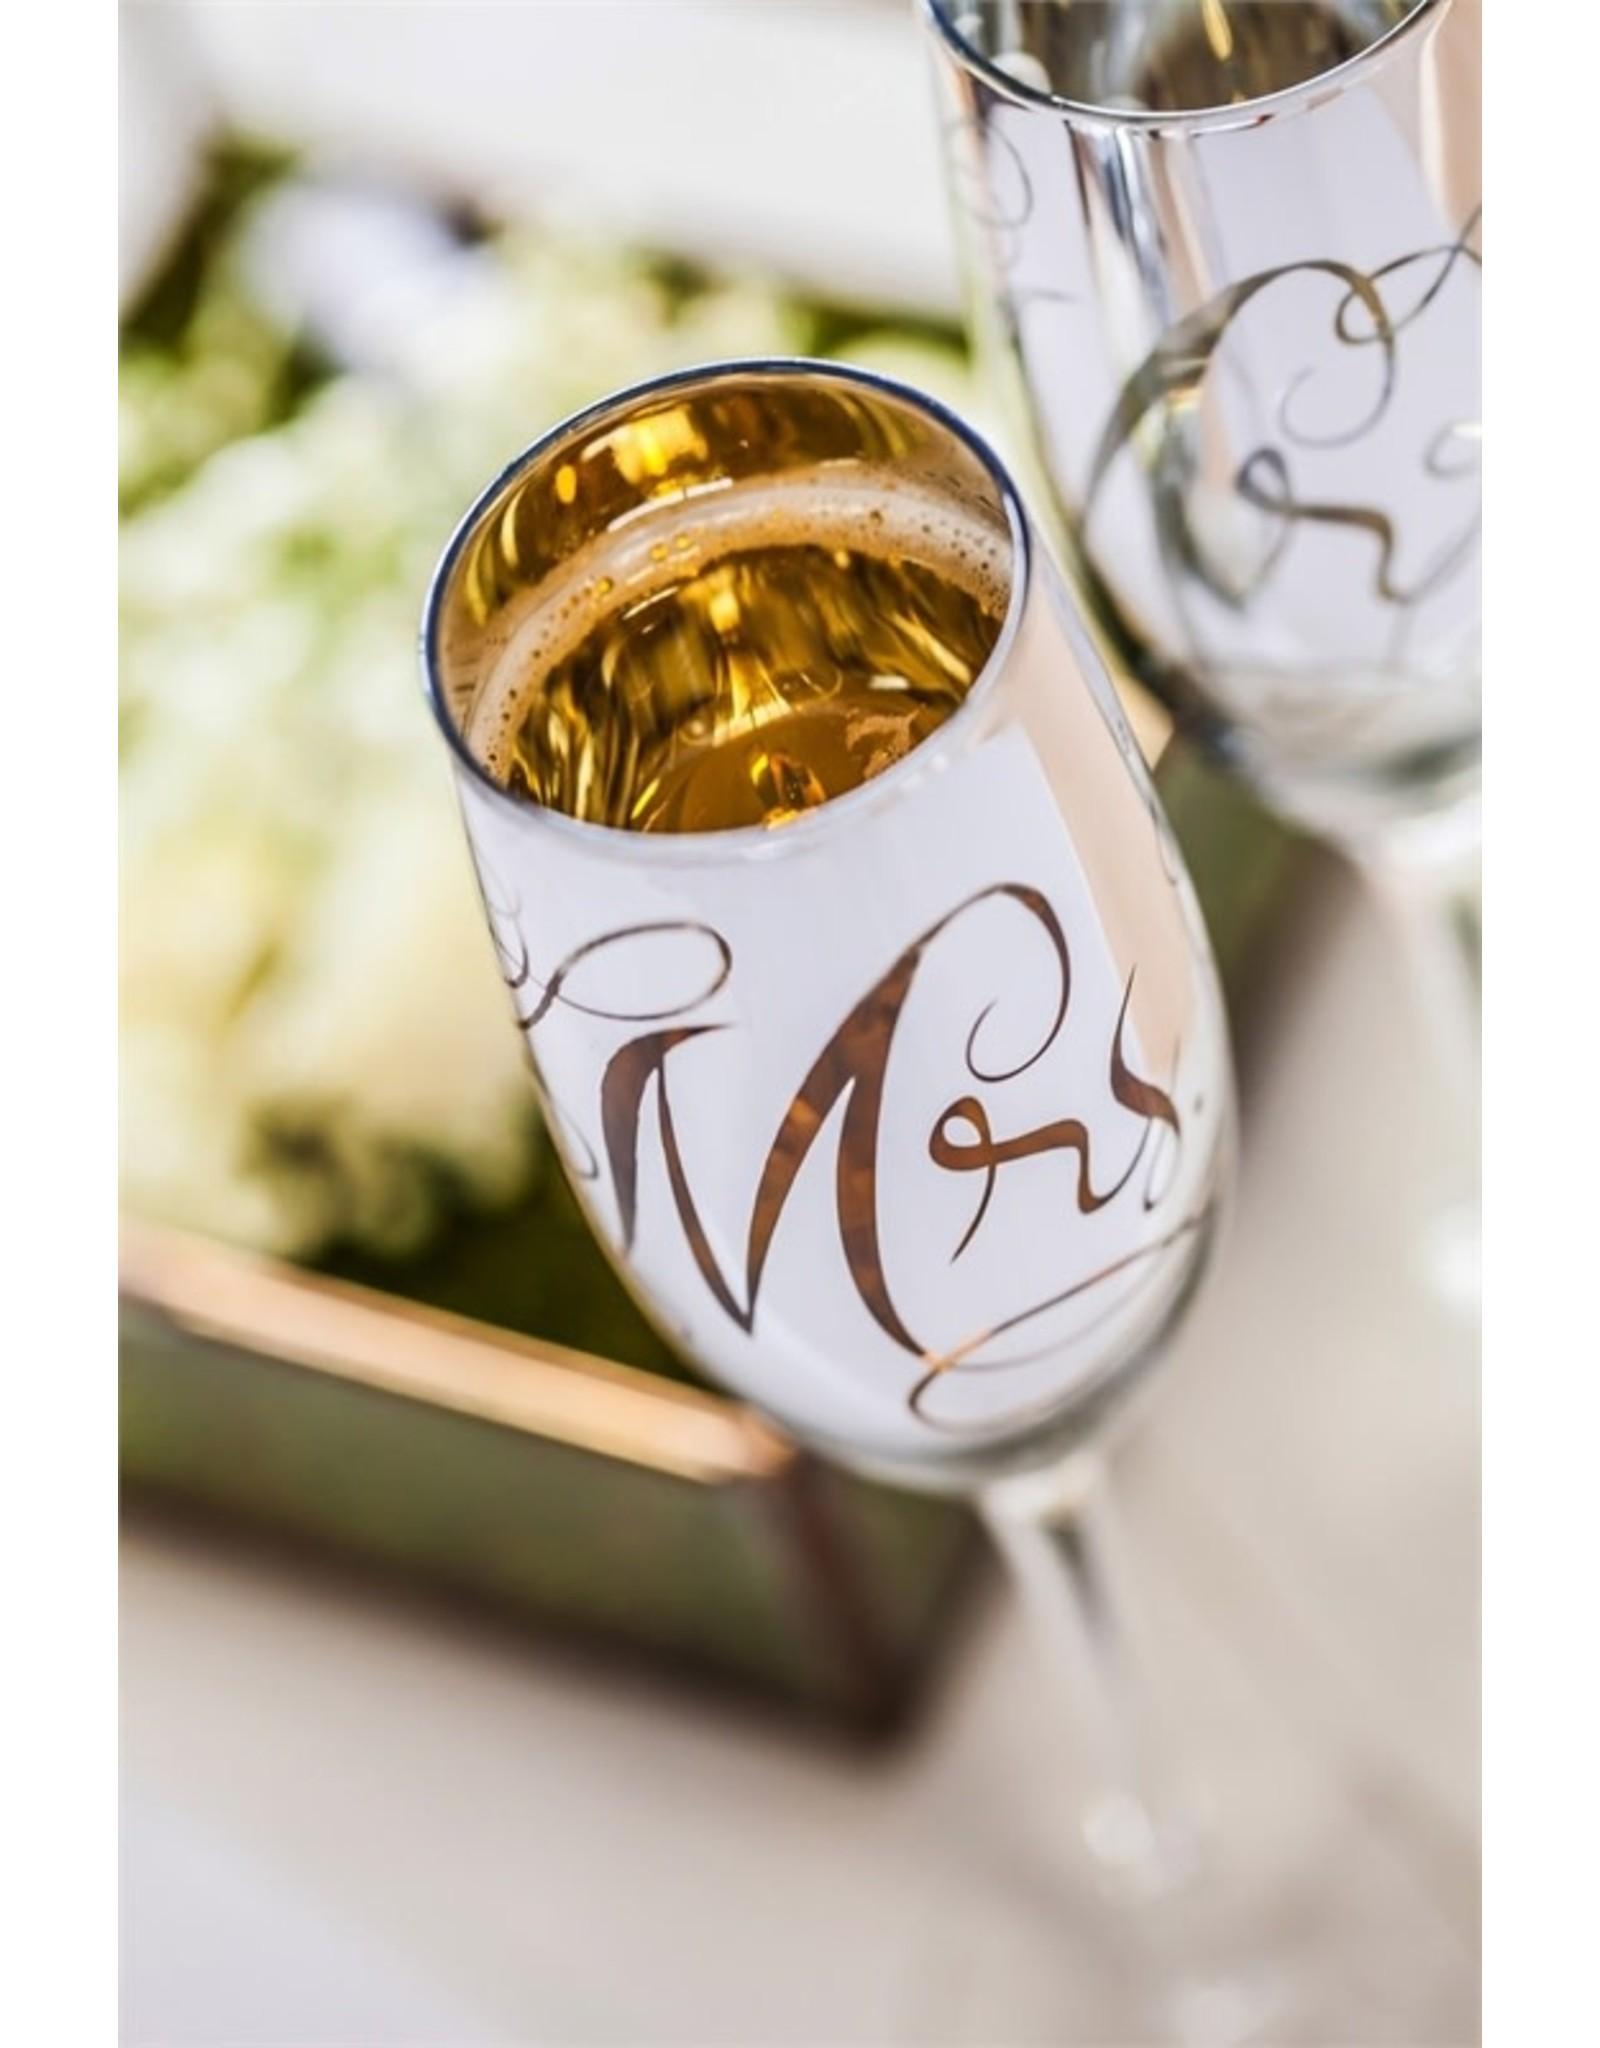 Evergreen Enterprises Mr. & Mrs. Champagne Flutes, 8 OZ., Silver Metallic, Set of 2